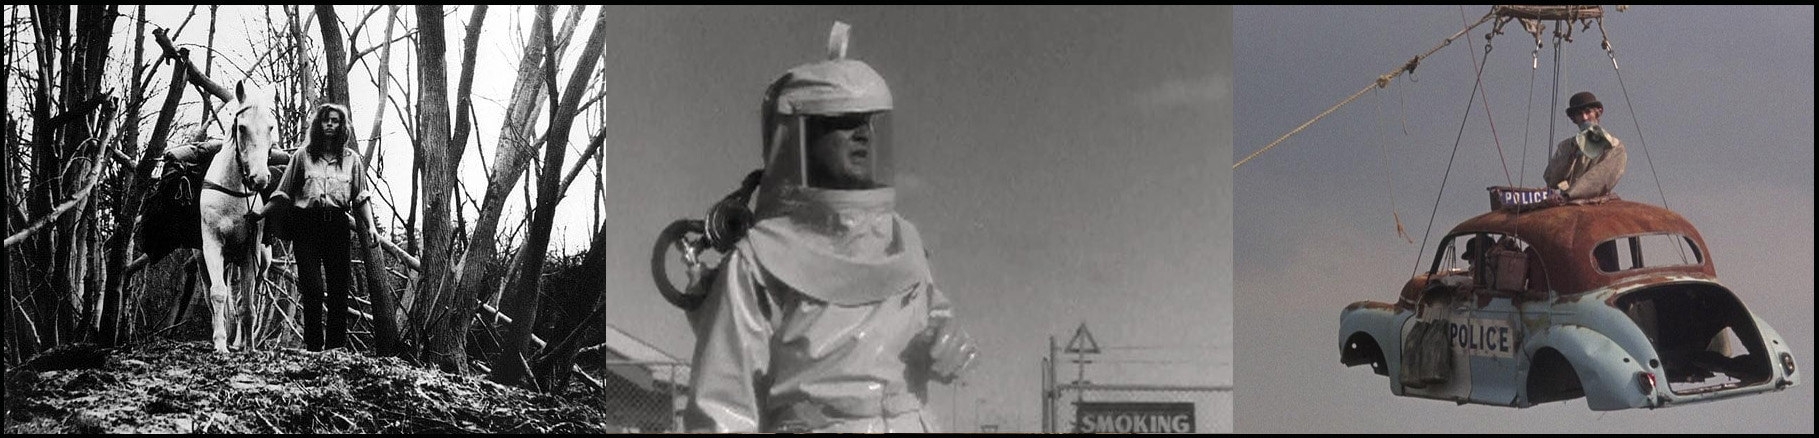 Endzeitfilme 60er Jahre